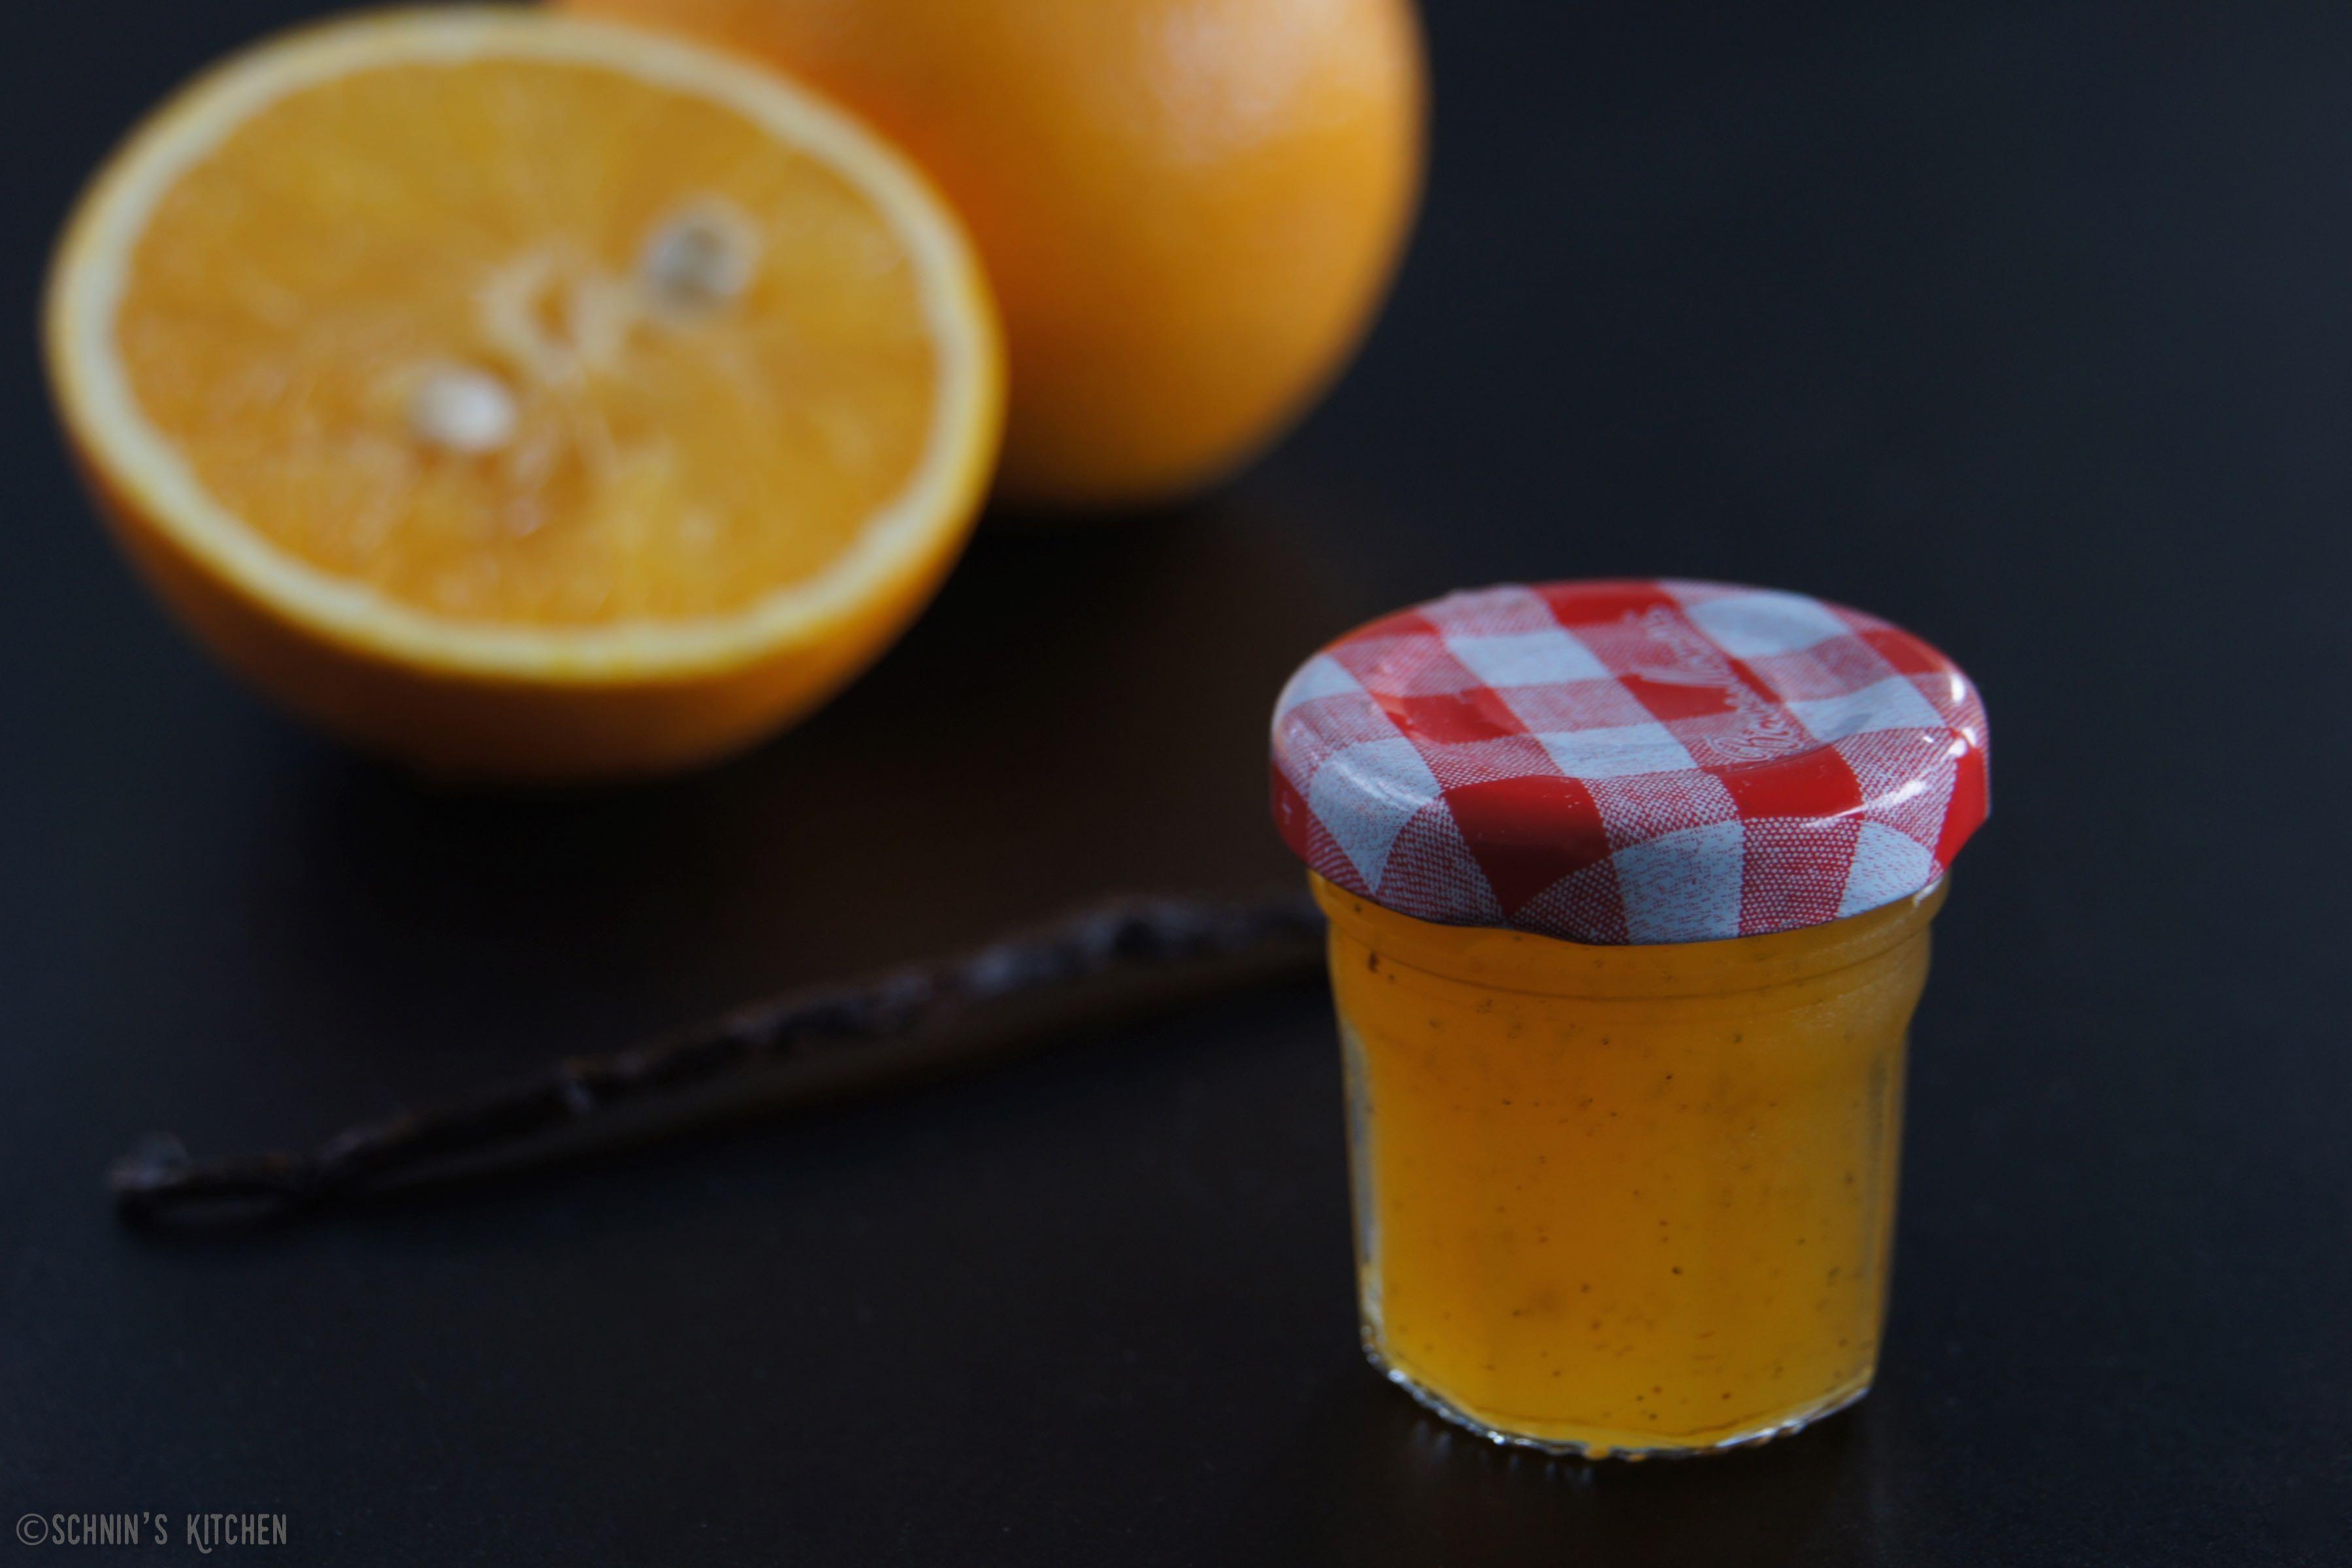 orangen vanille gelee schnin 39 s kitchen. Black Bedroom Furniture Sets. Home Design Ideas